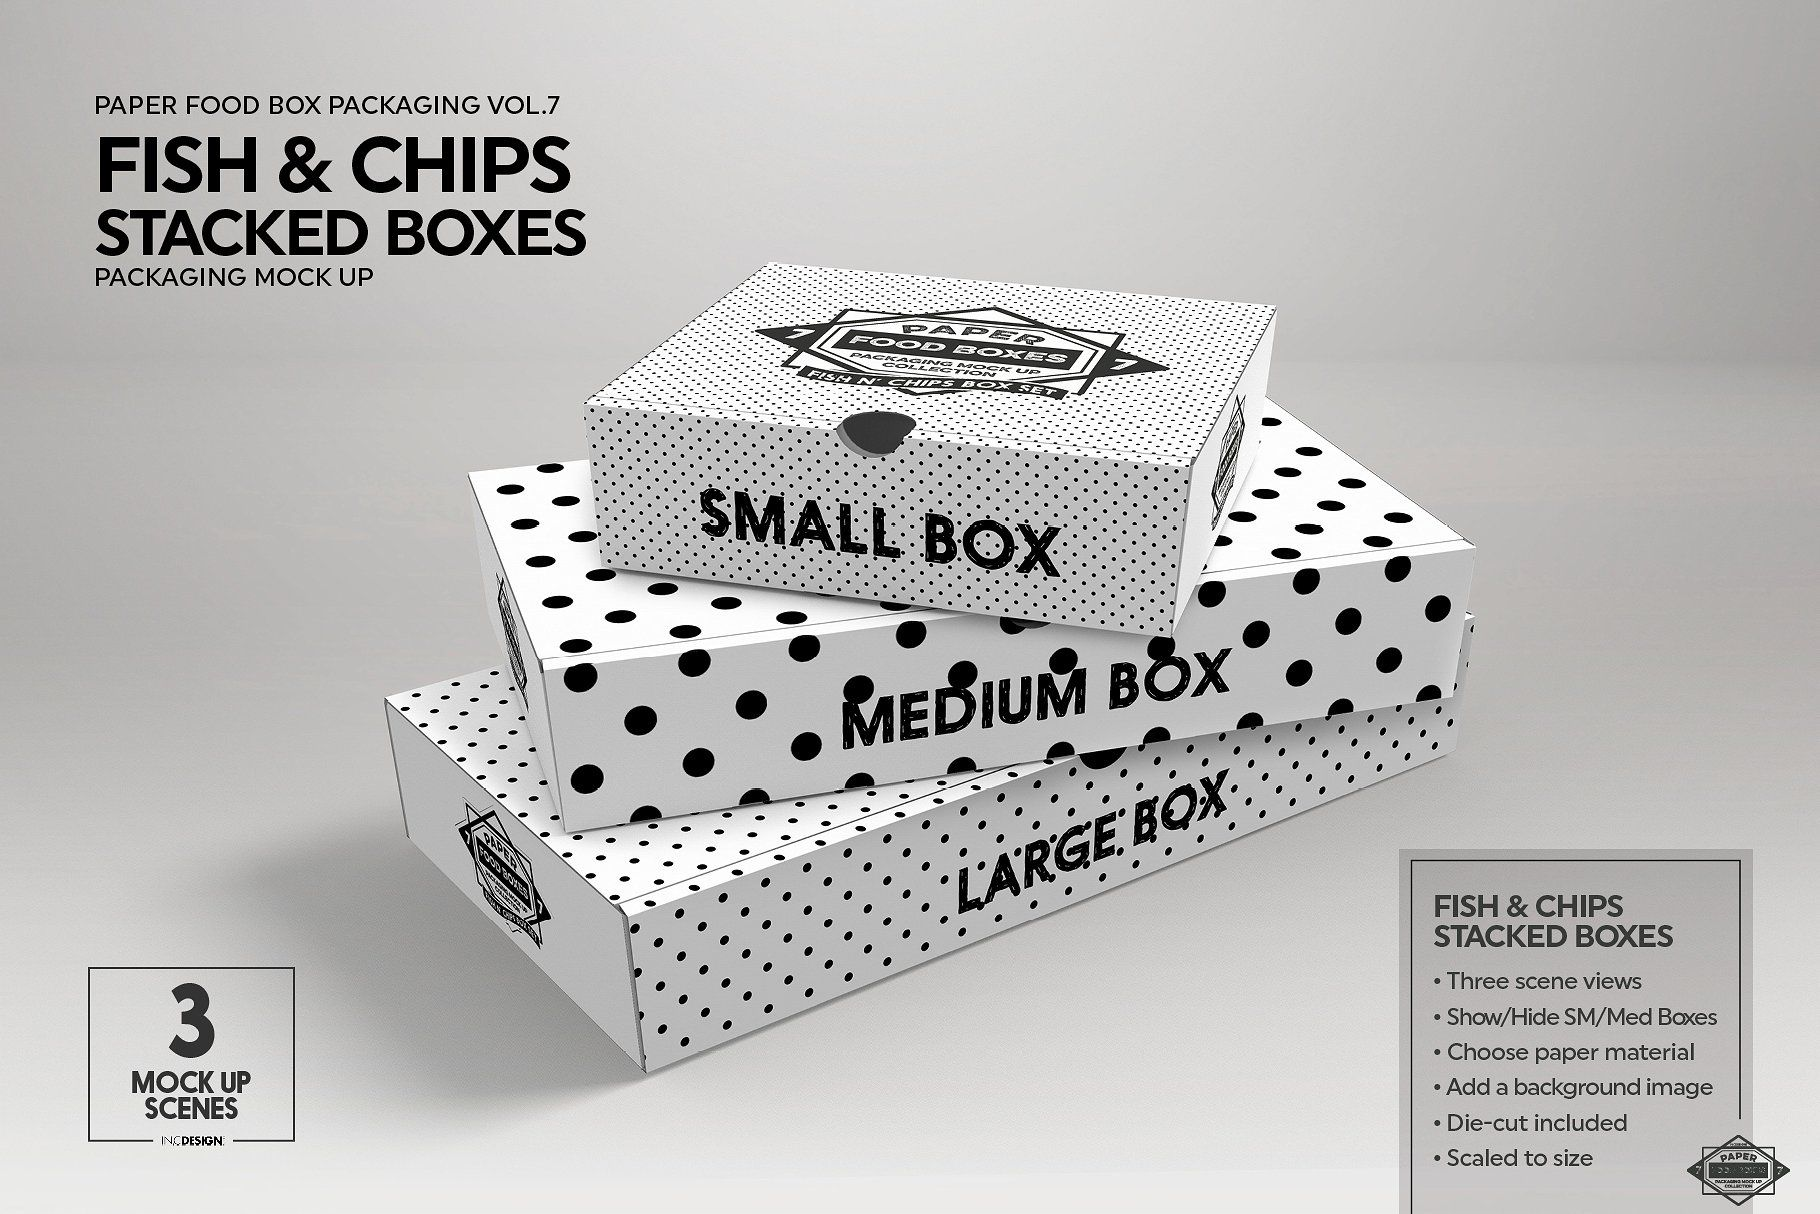 Download Vol 7 Food Box Packaging Mockups Packaging Mockup Food Box Packaging Free Packaging Mockup